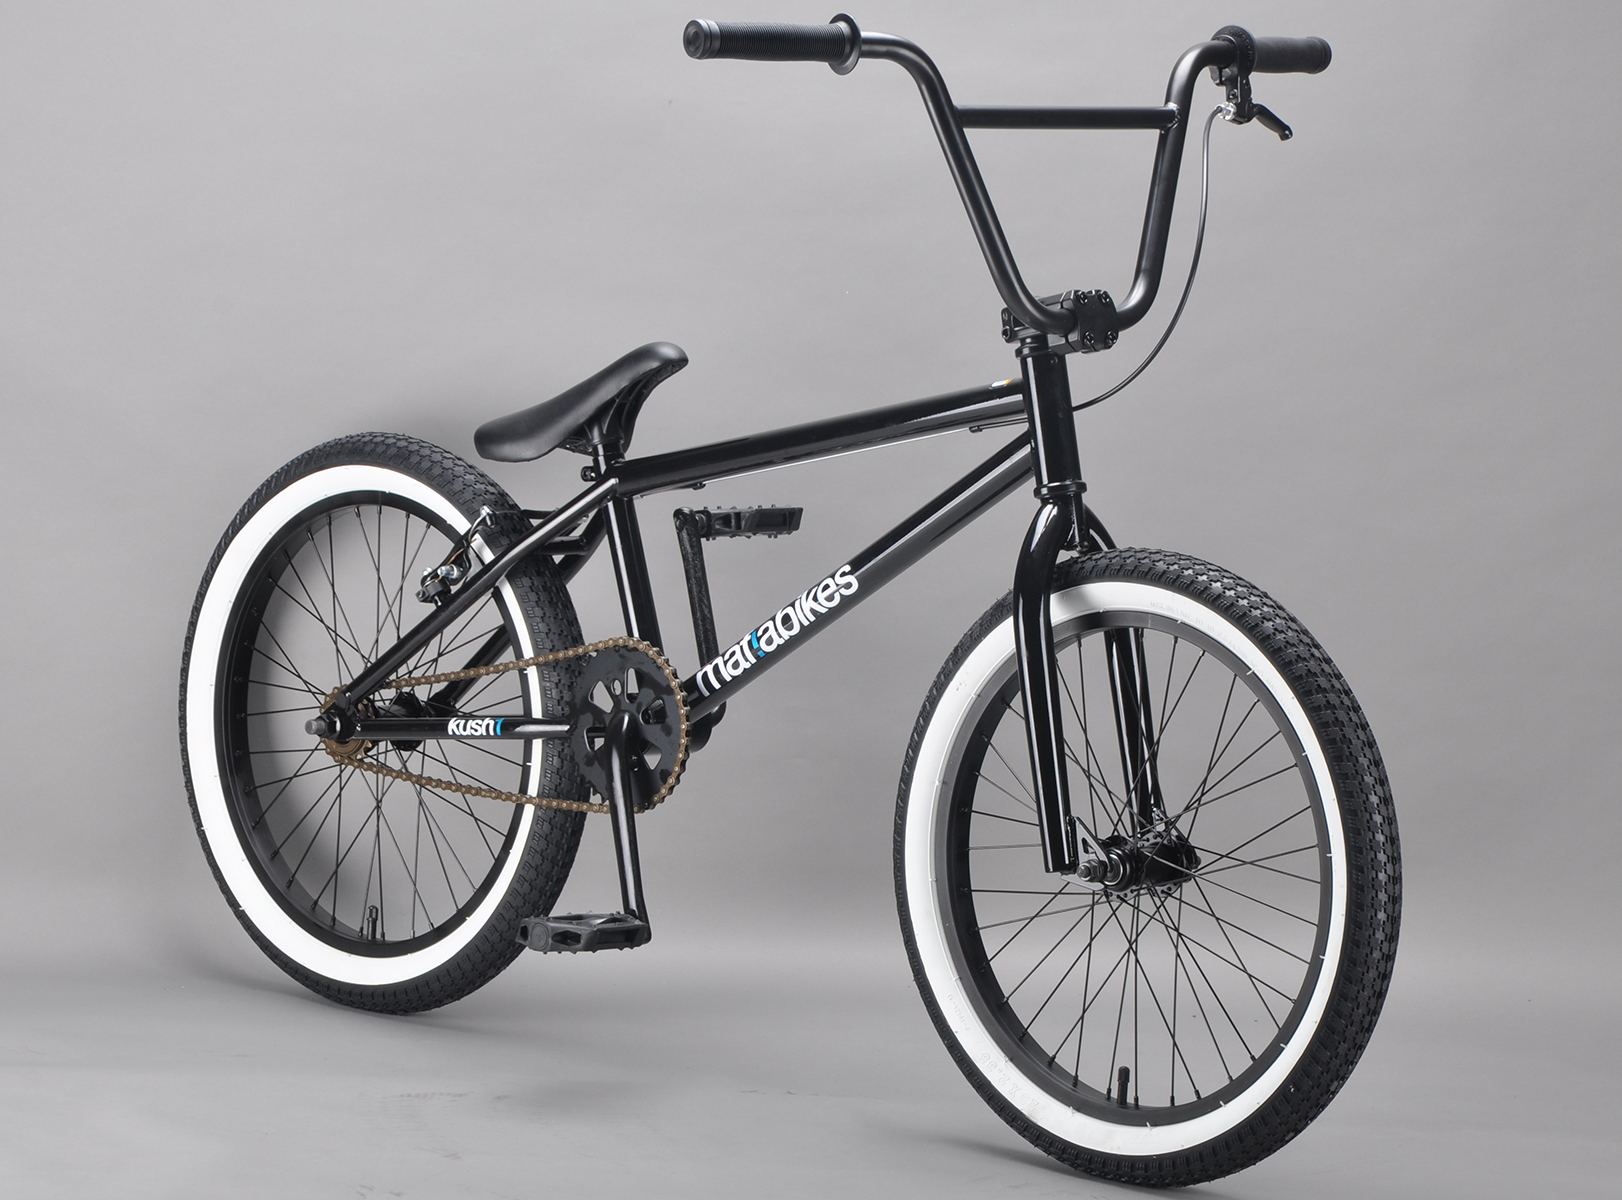 mafiabikes-kush1-bmx-bike